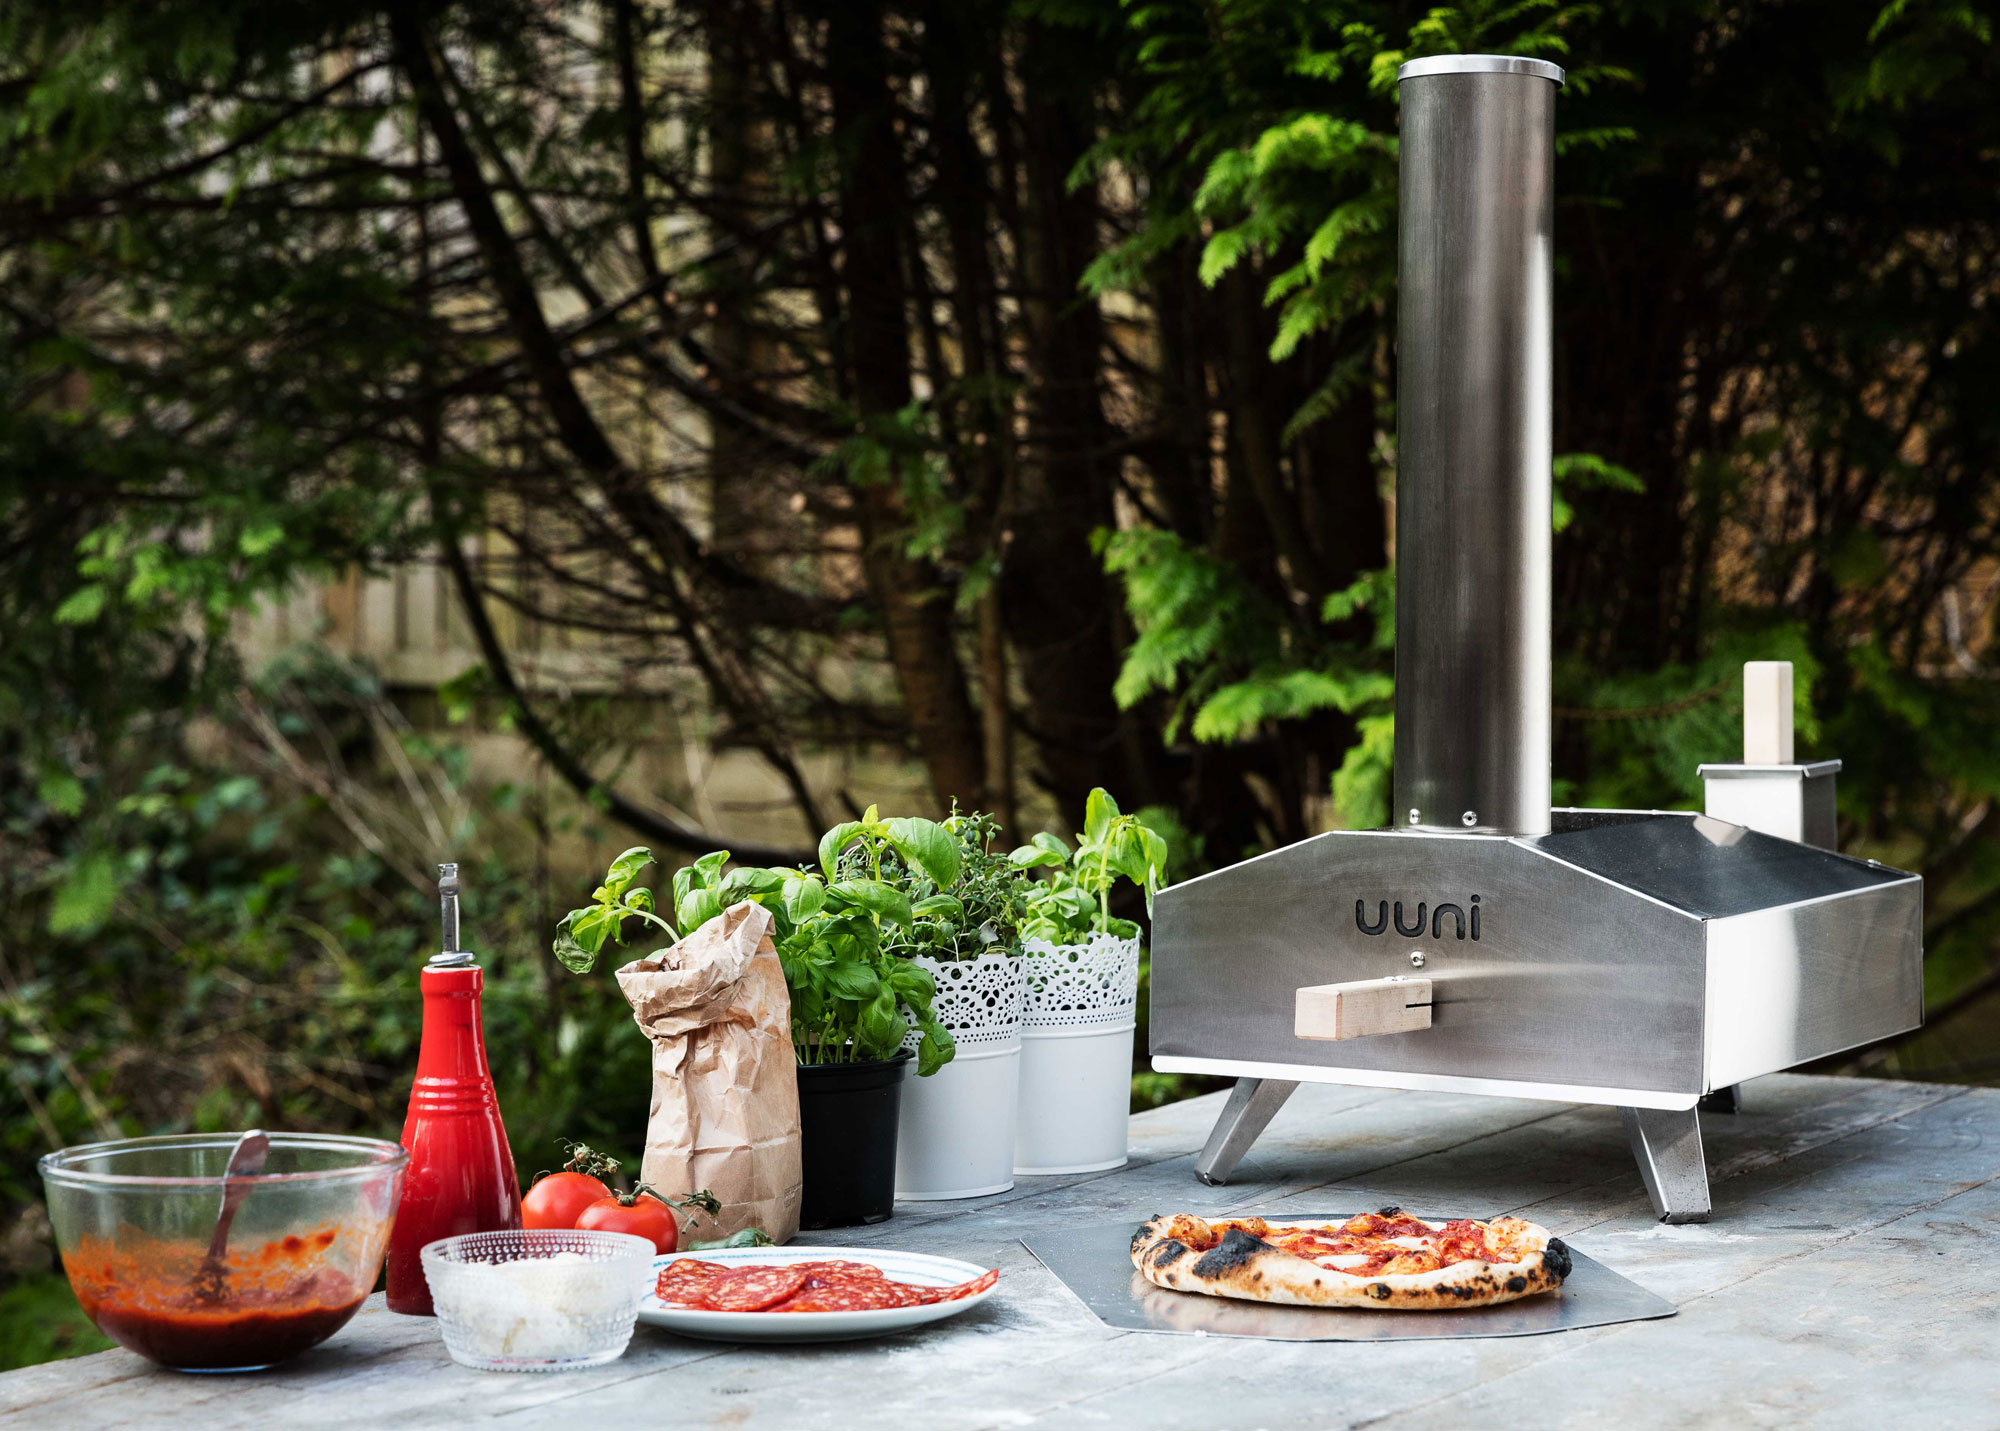 Uuni Pizzaofen / Pellet Pizzaofen Uuni 3 Bild 4